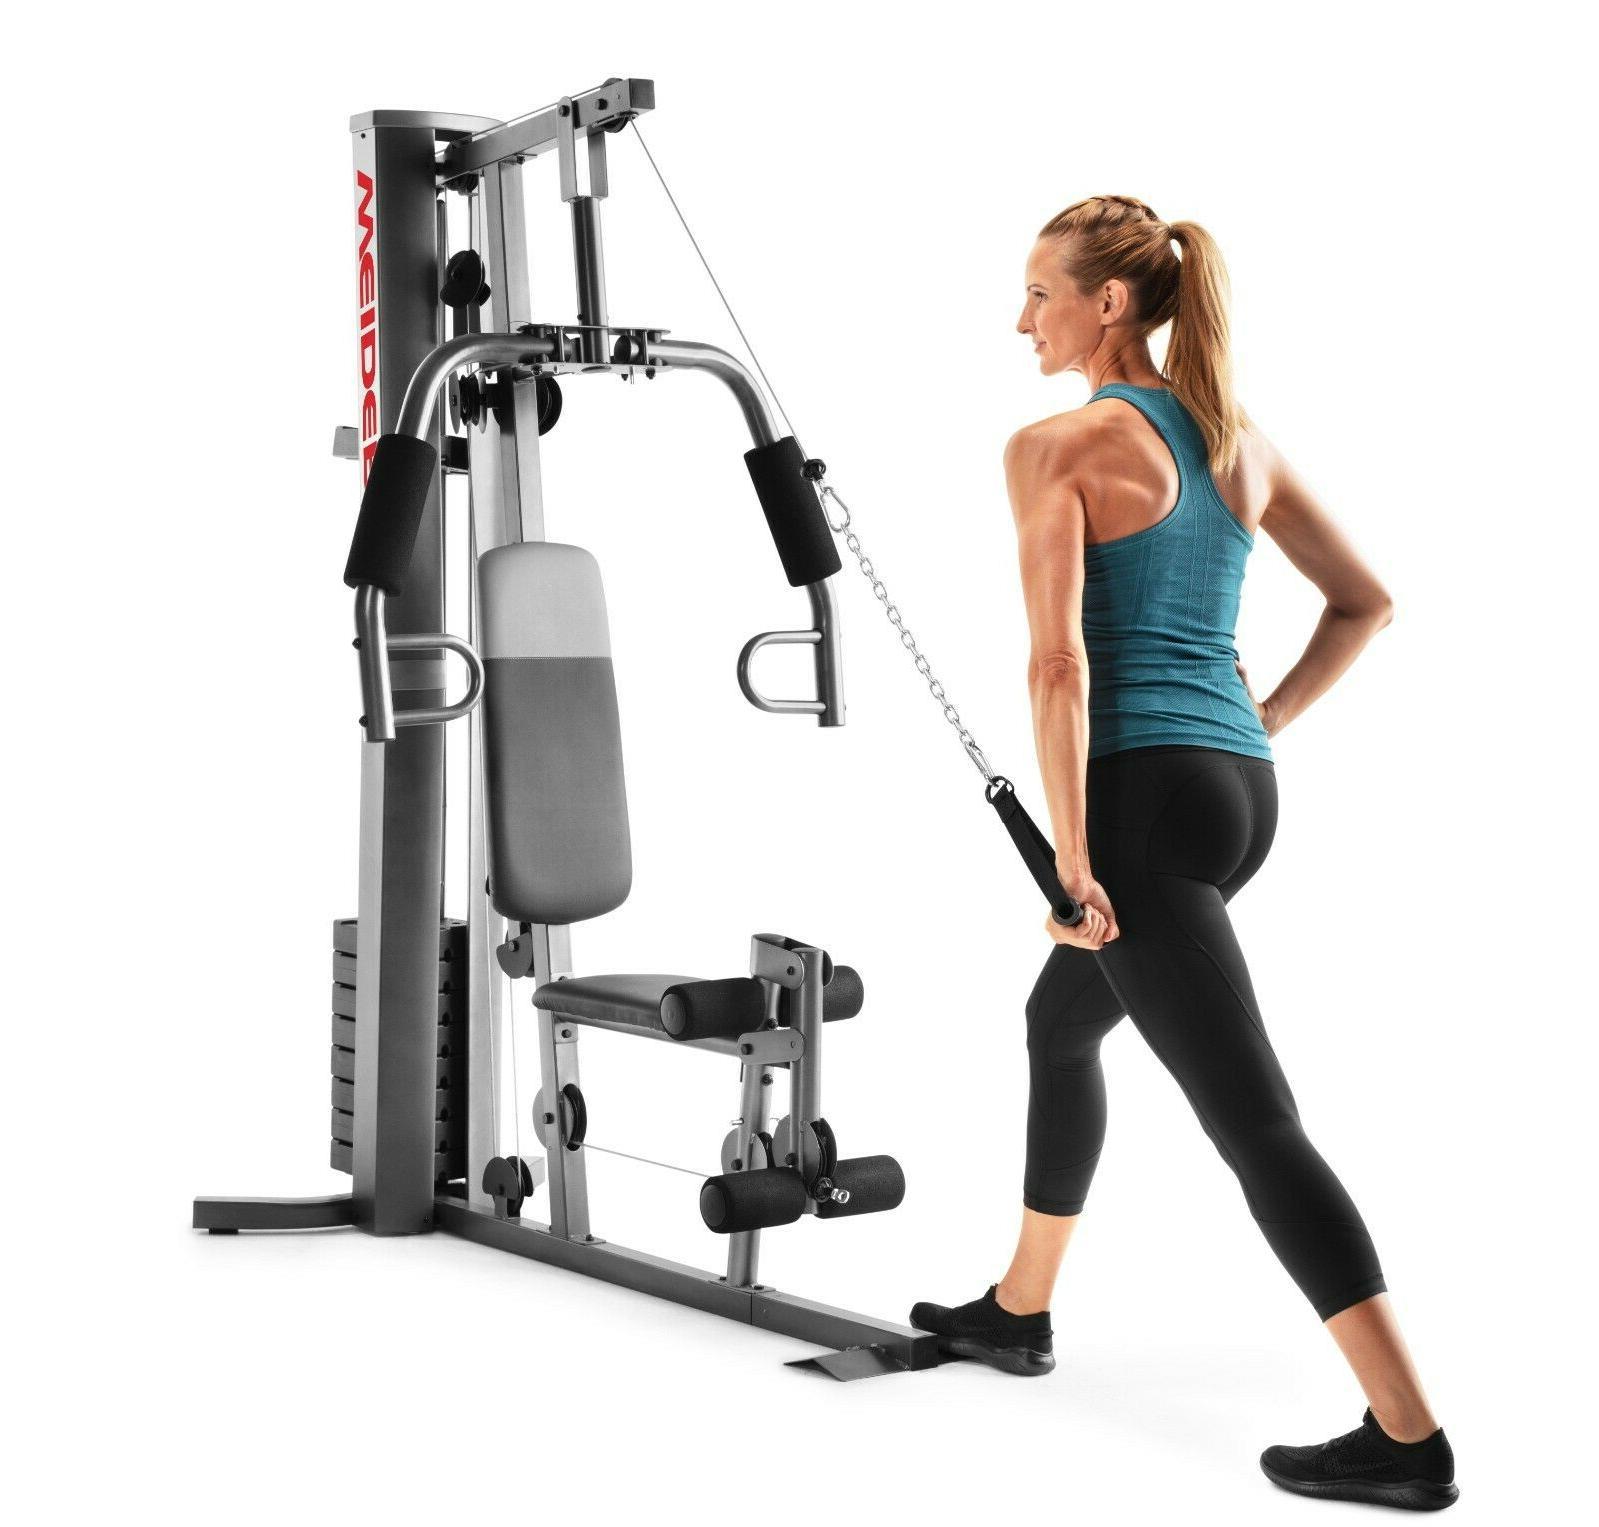 HOME GYM Training Fitness Strength Equipment Exercise